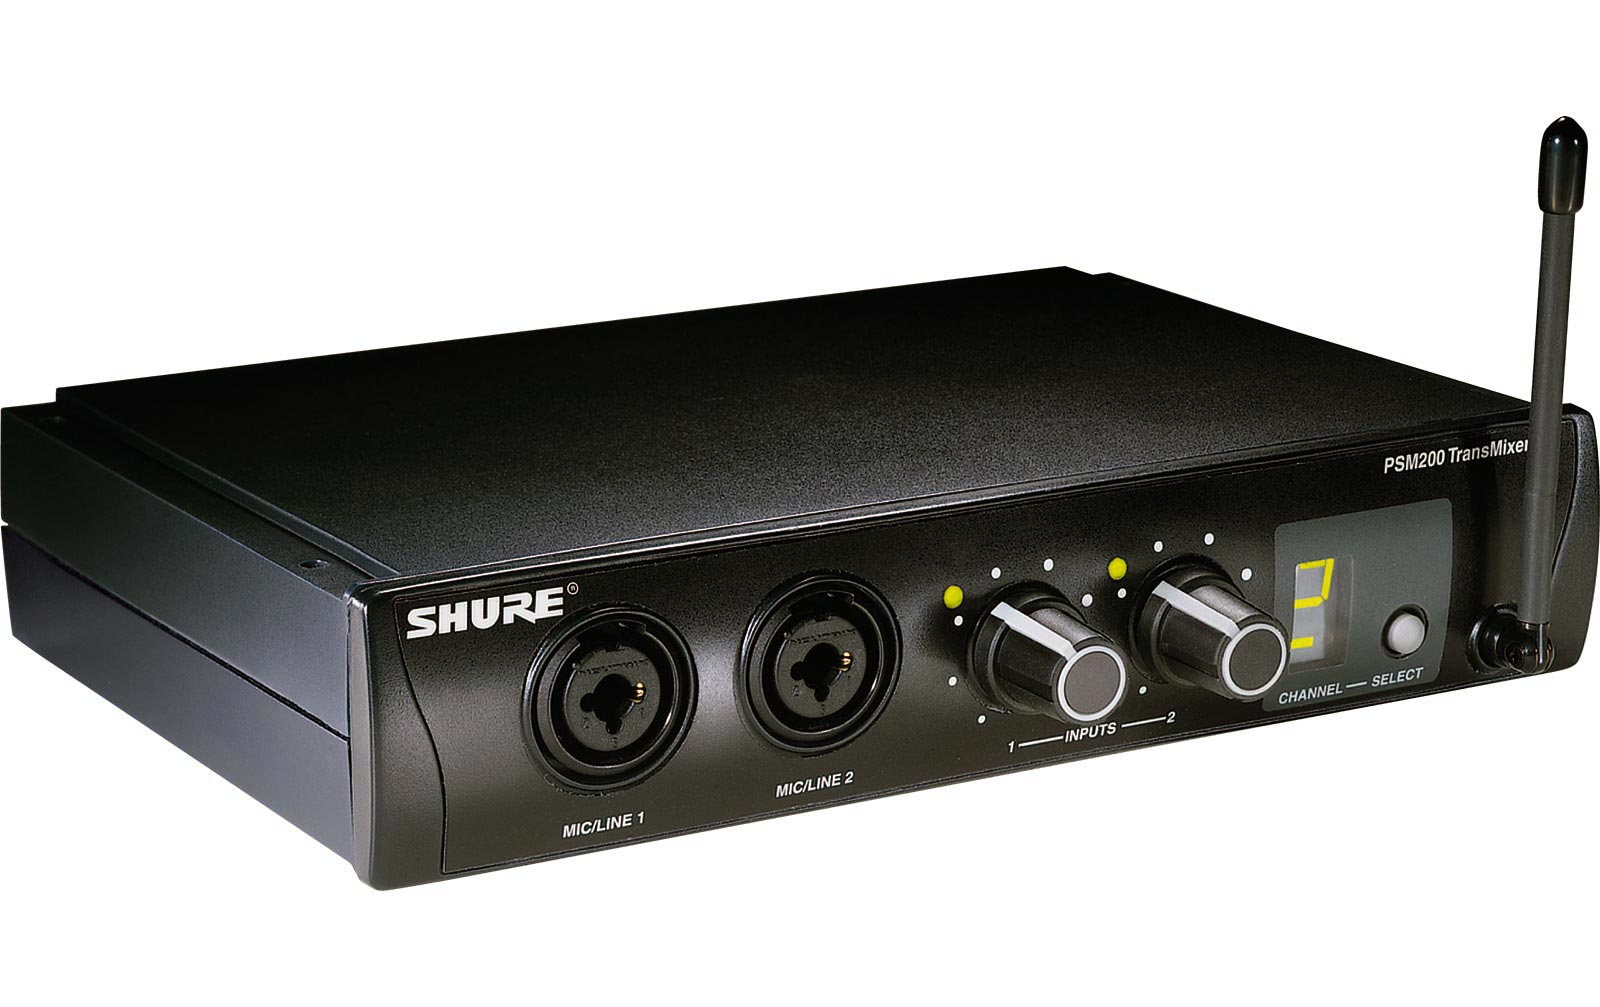 Shure P2T Q3 TransMixer (749 - 782 MHz)